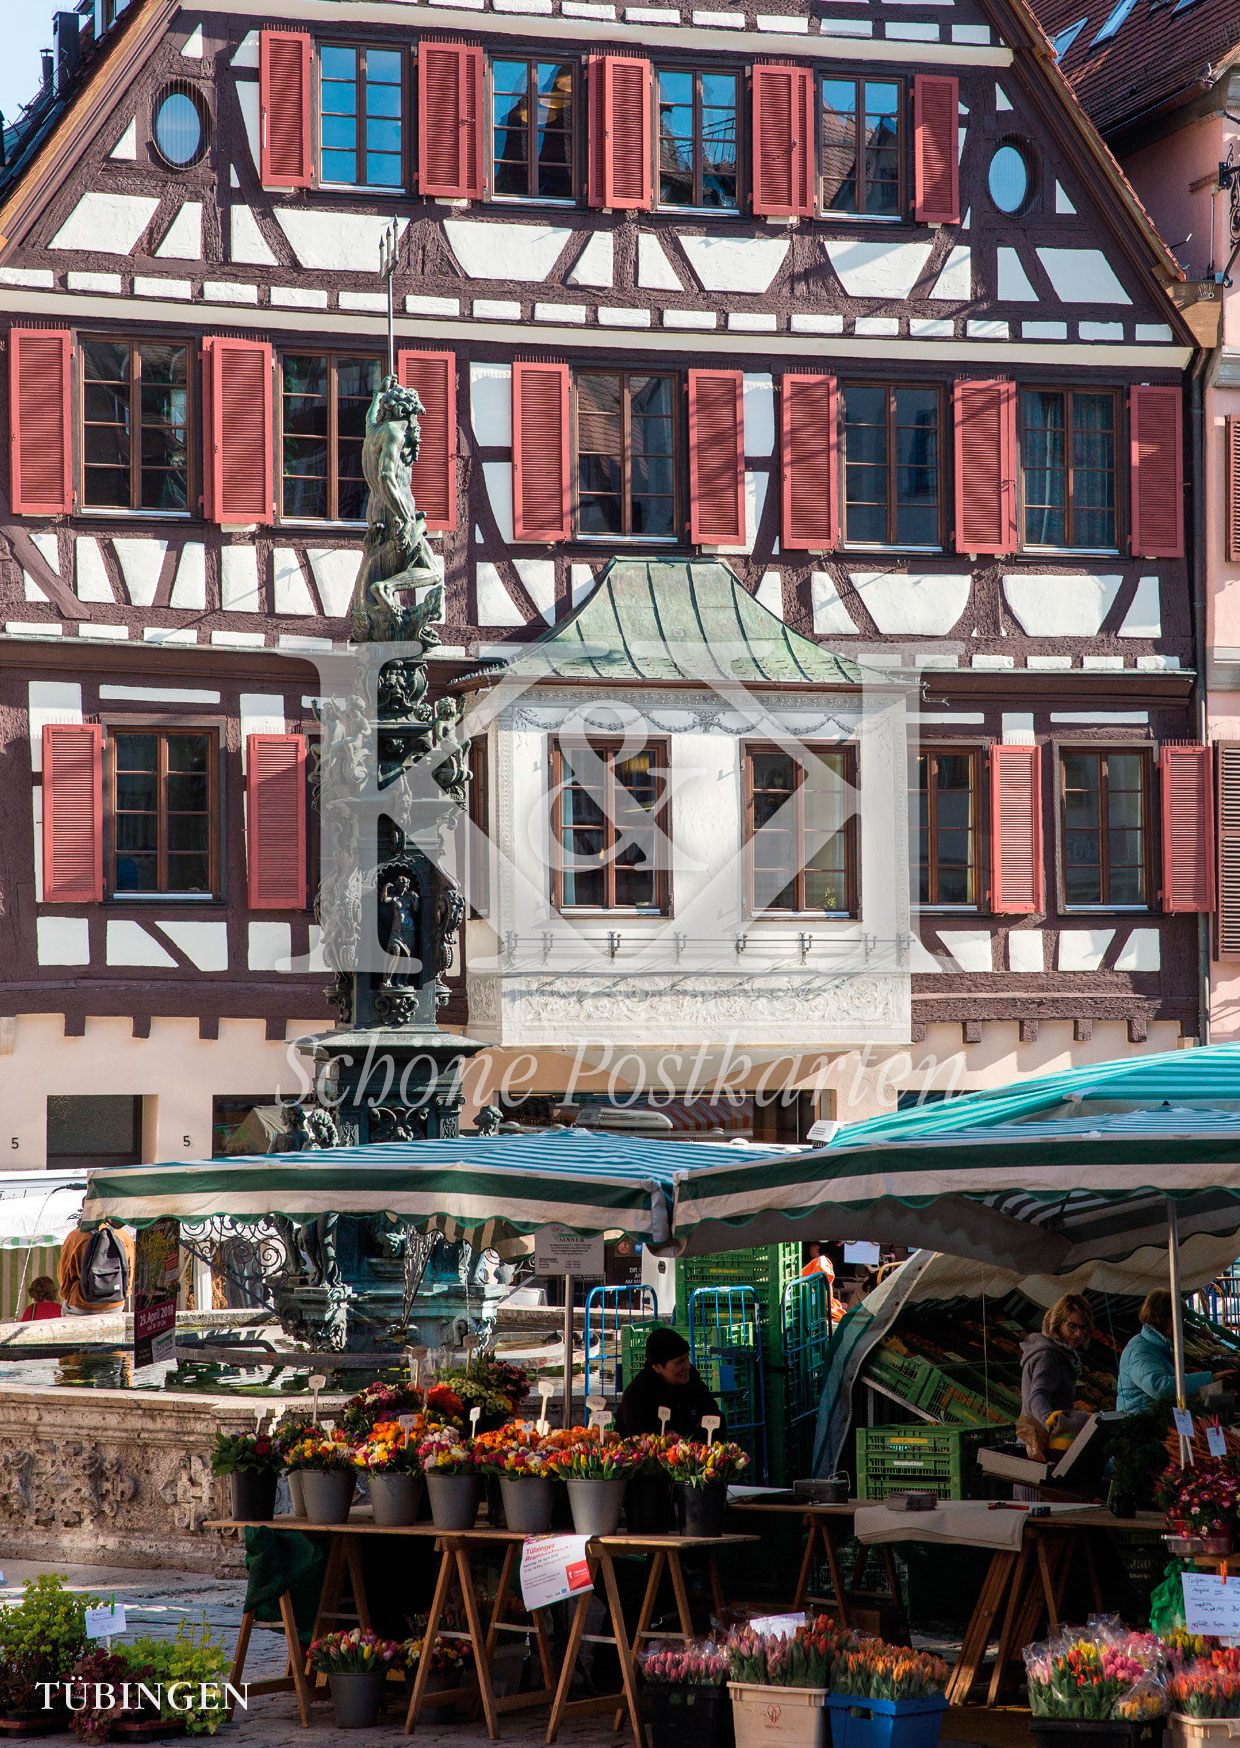 <strong>Schöne Postkarte Nr. 248</strong> · Tübinger Marktplatz mit Neptunbrunnen © 2018